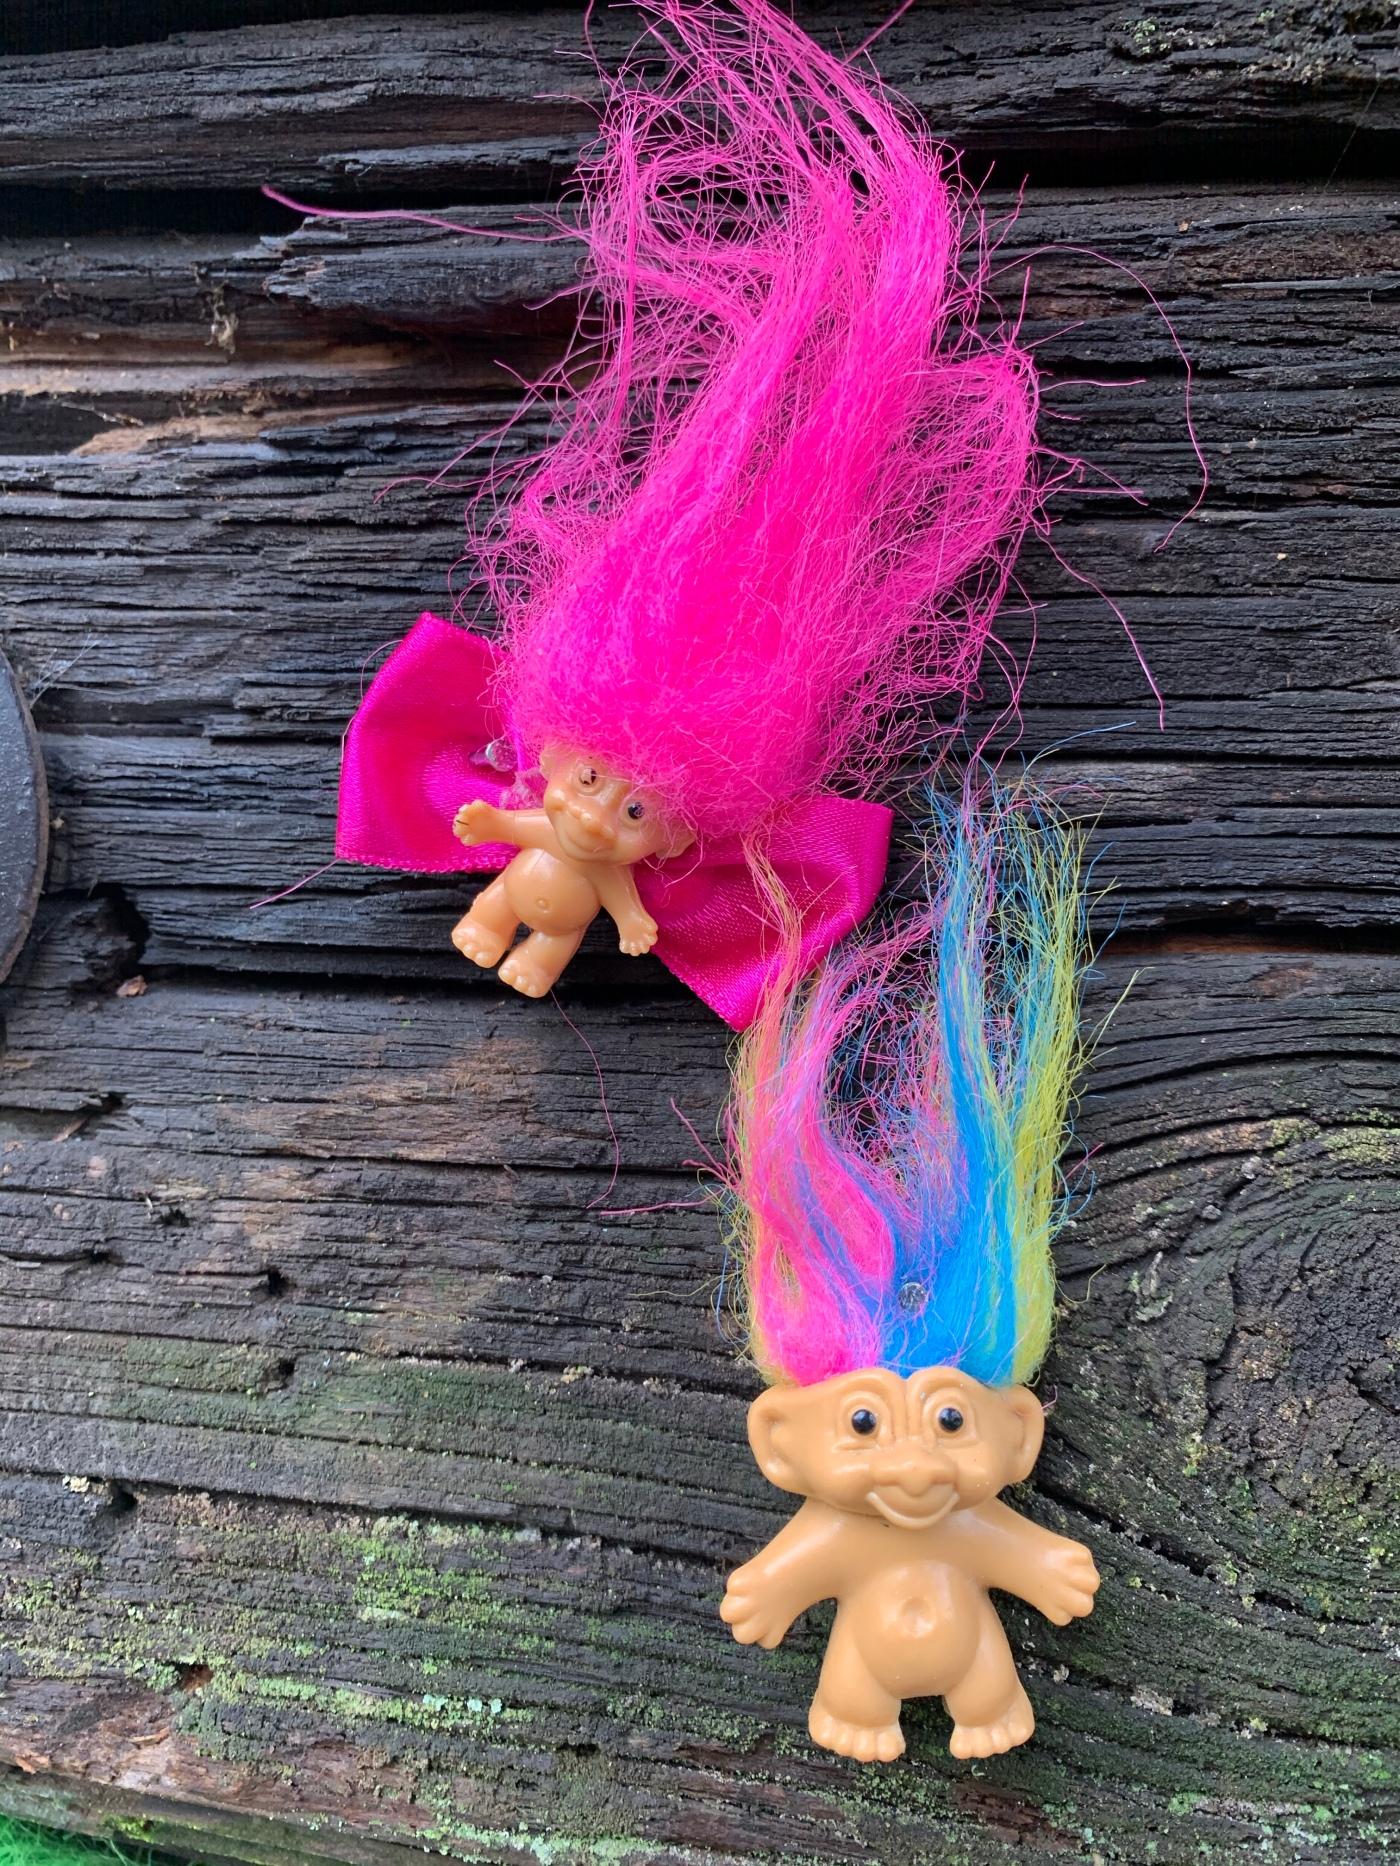 Troll toys nailed to Portland troll bridge